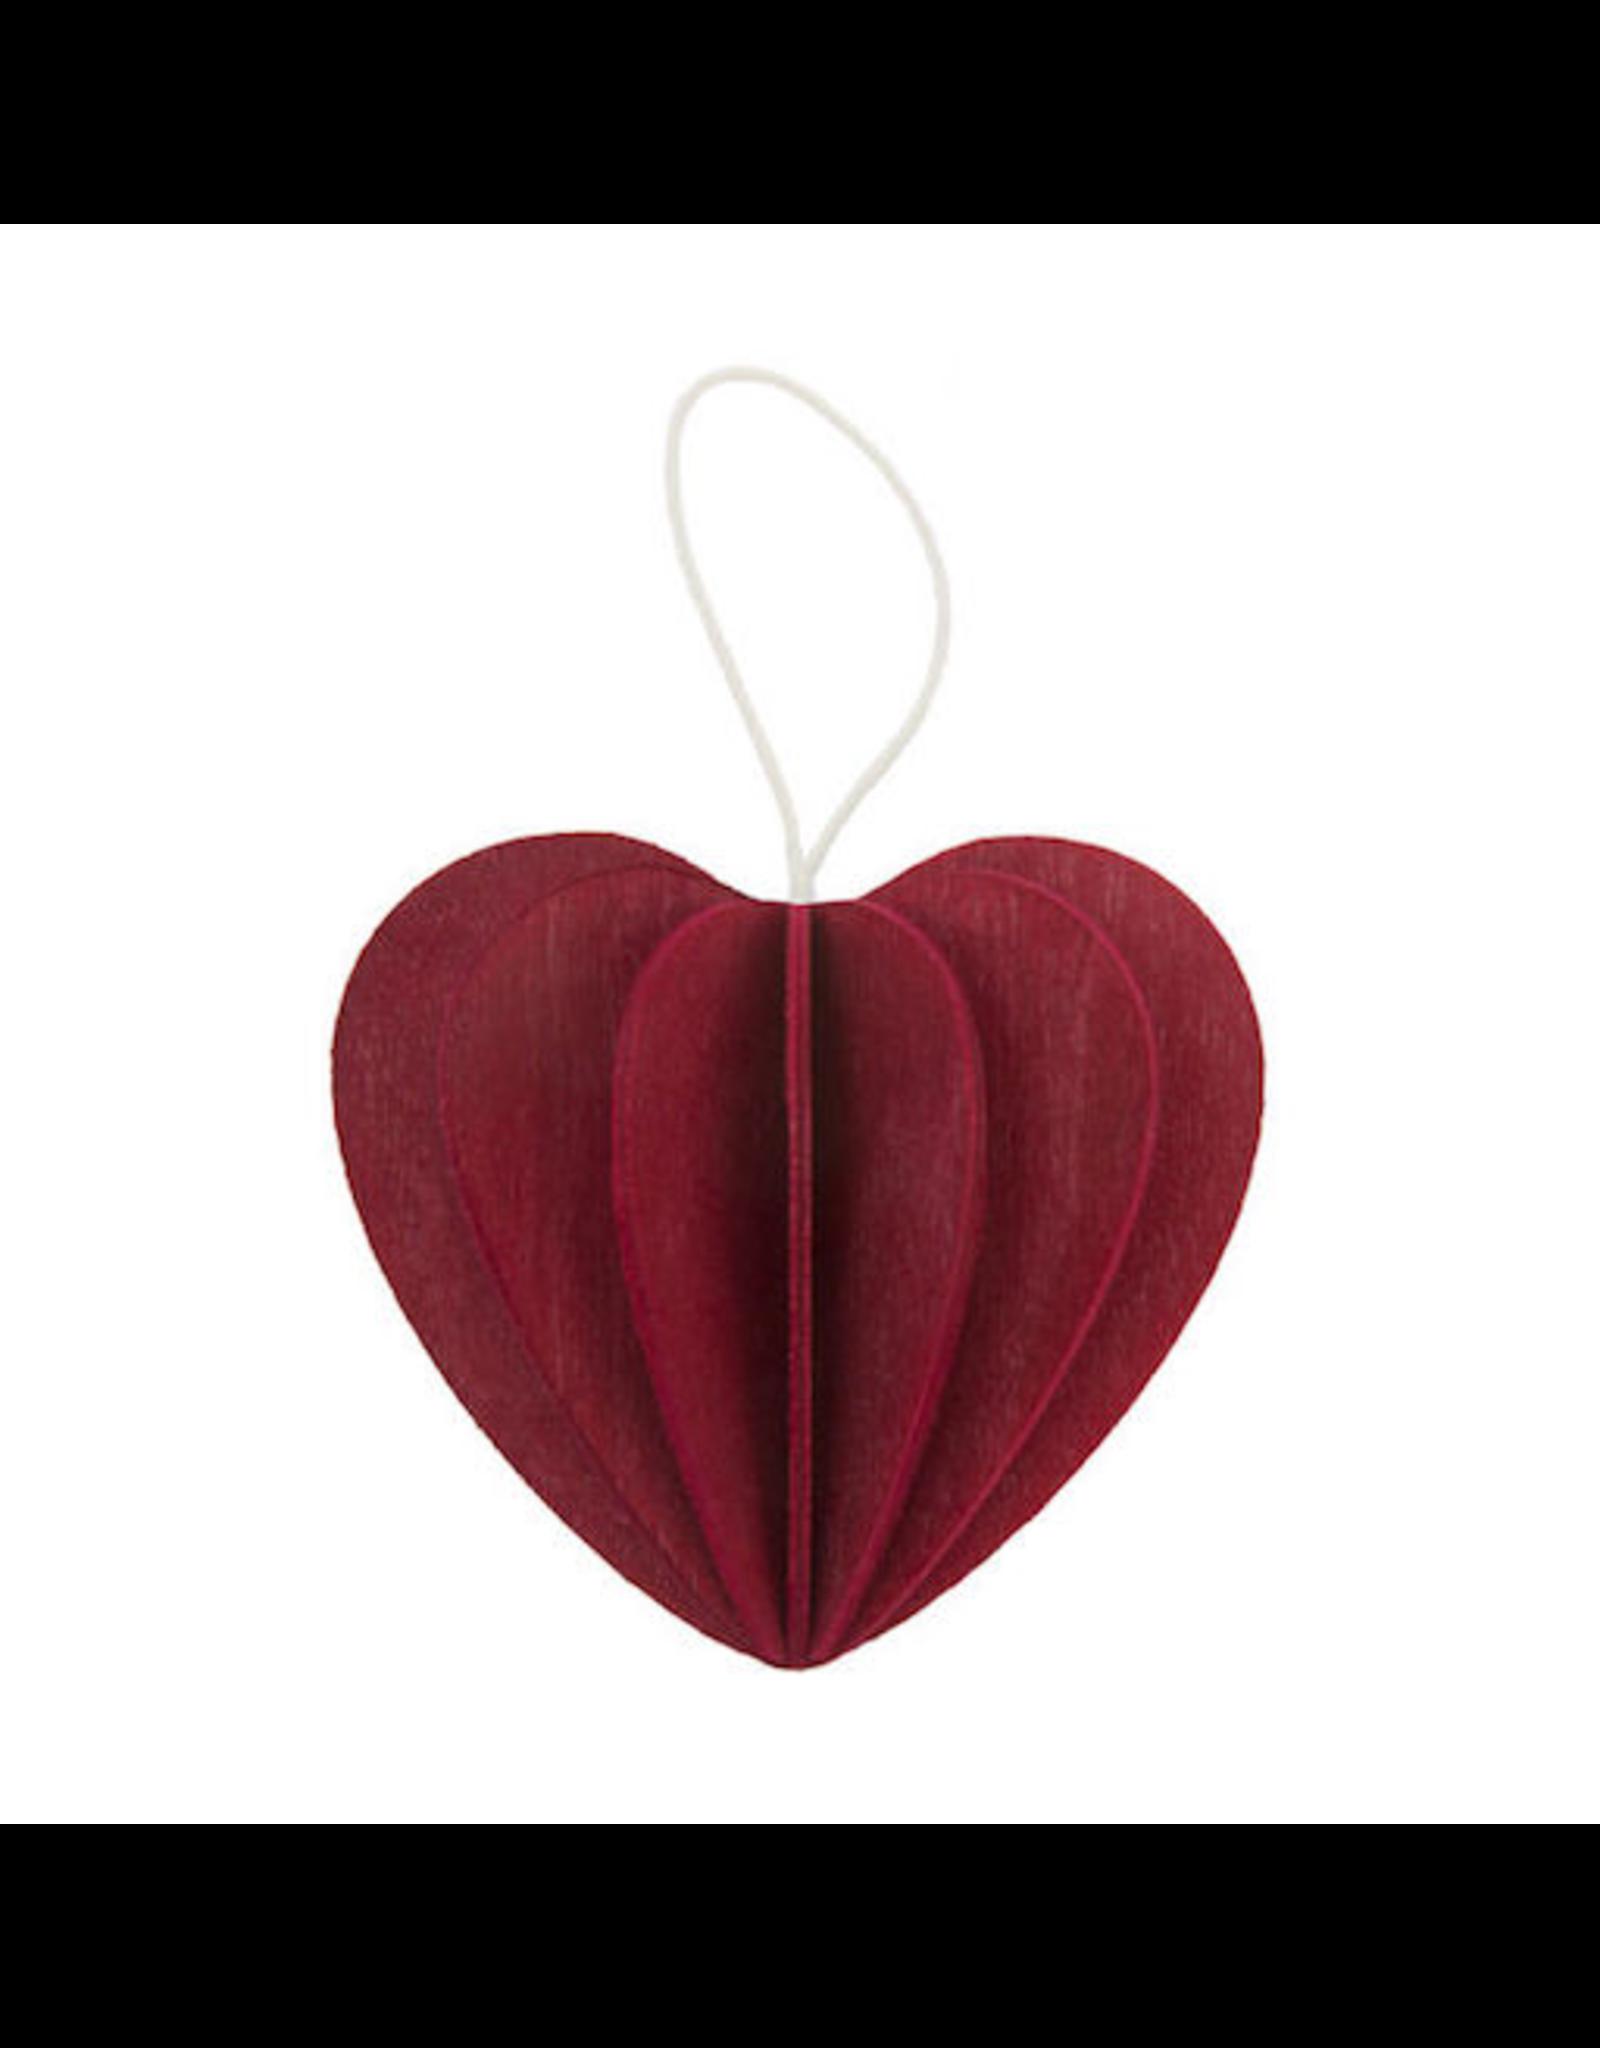 LOVI 深紅色心形掛件裝飾